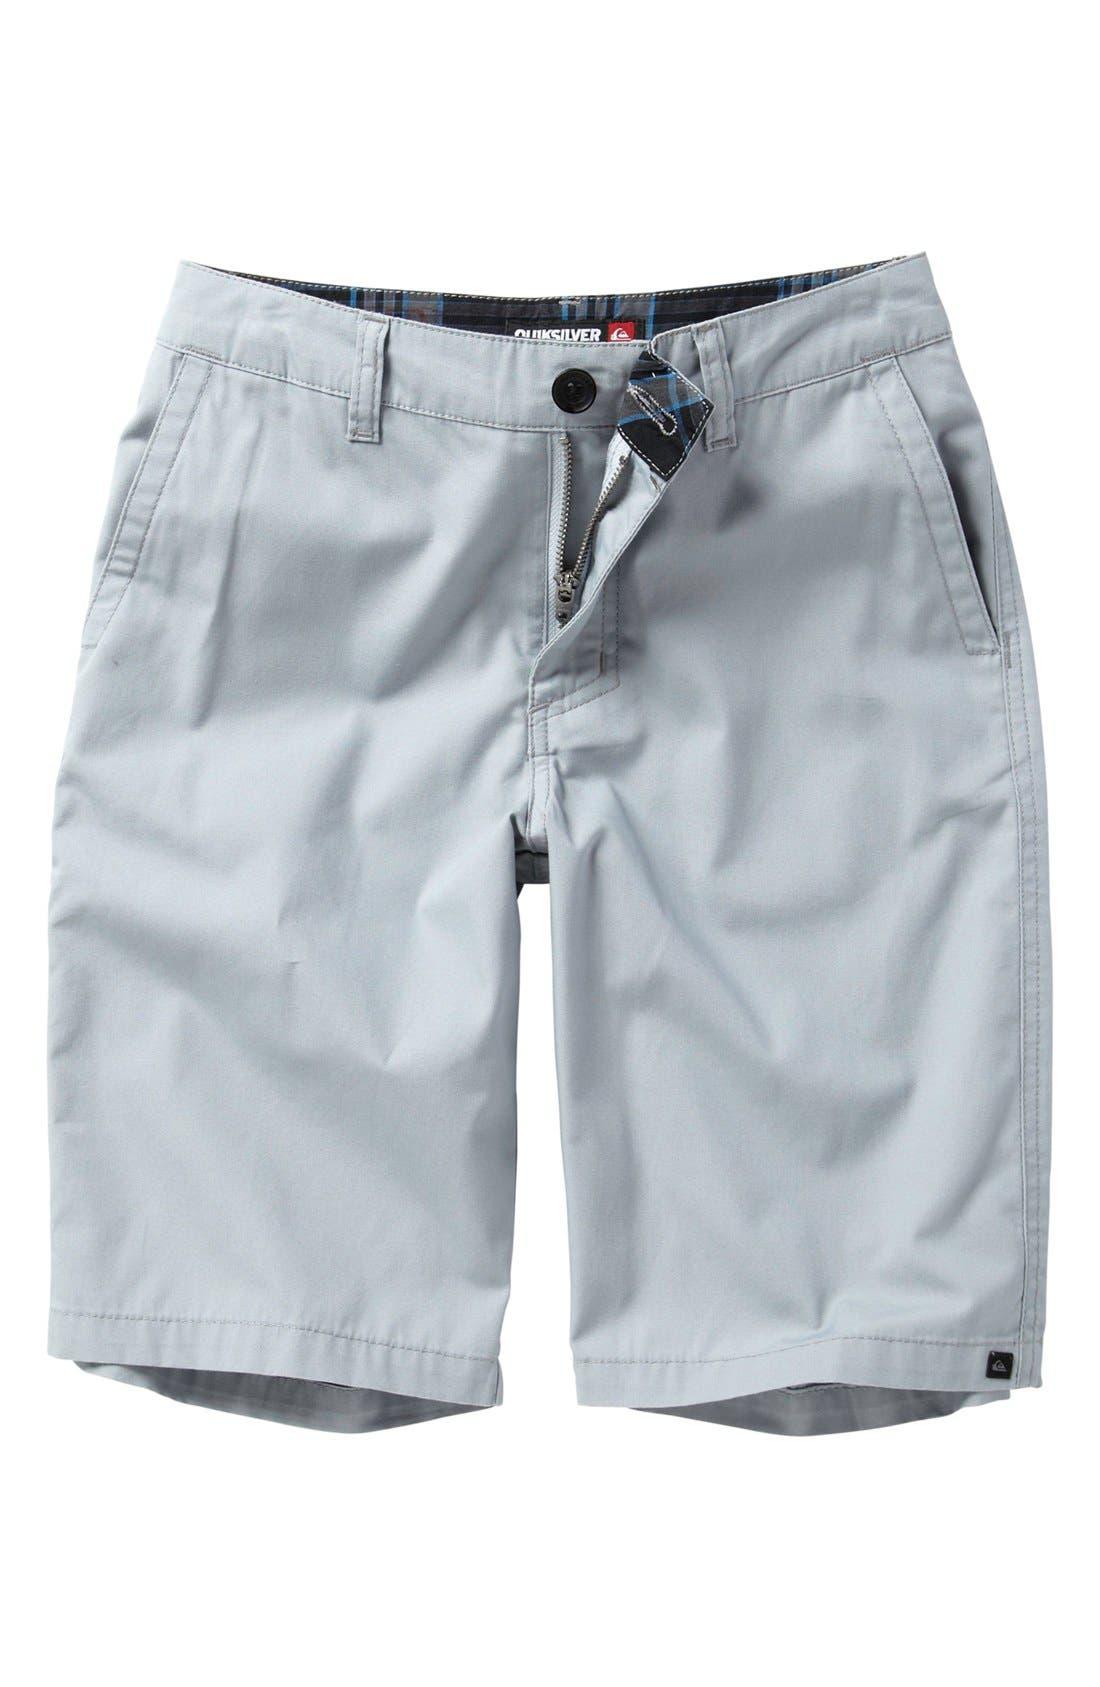 Main Image - Quiksilver 'Rockefeller' Shorts (Big Boys)